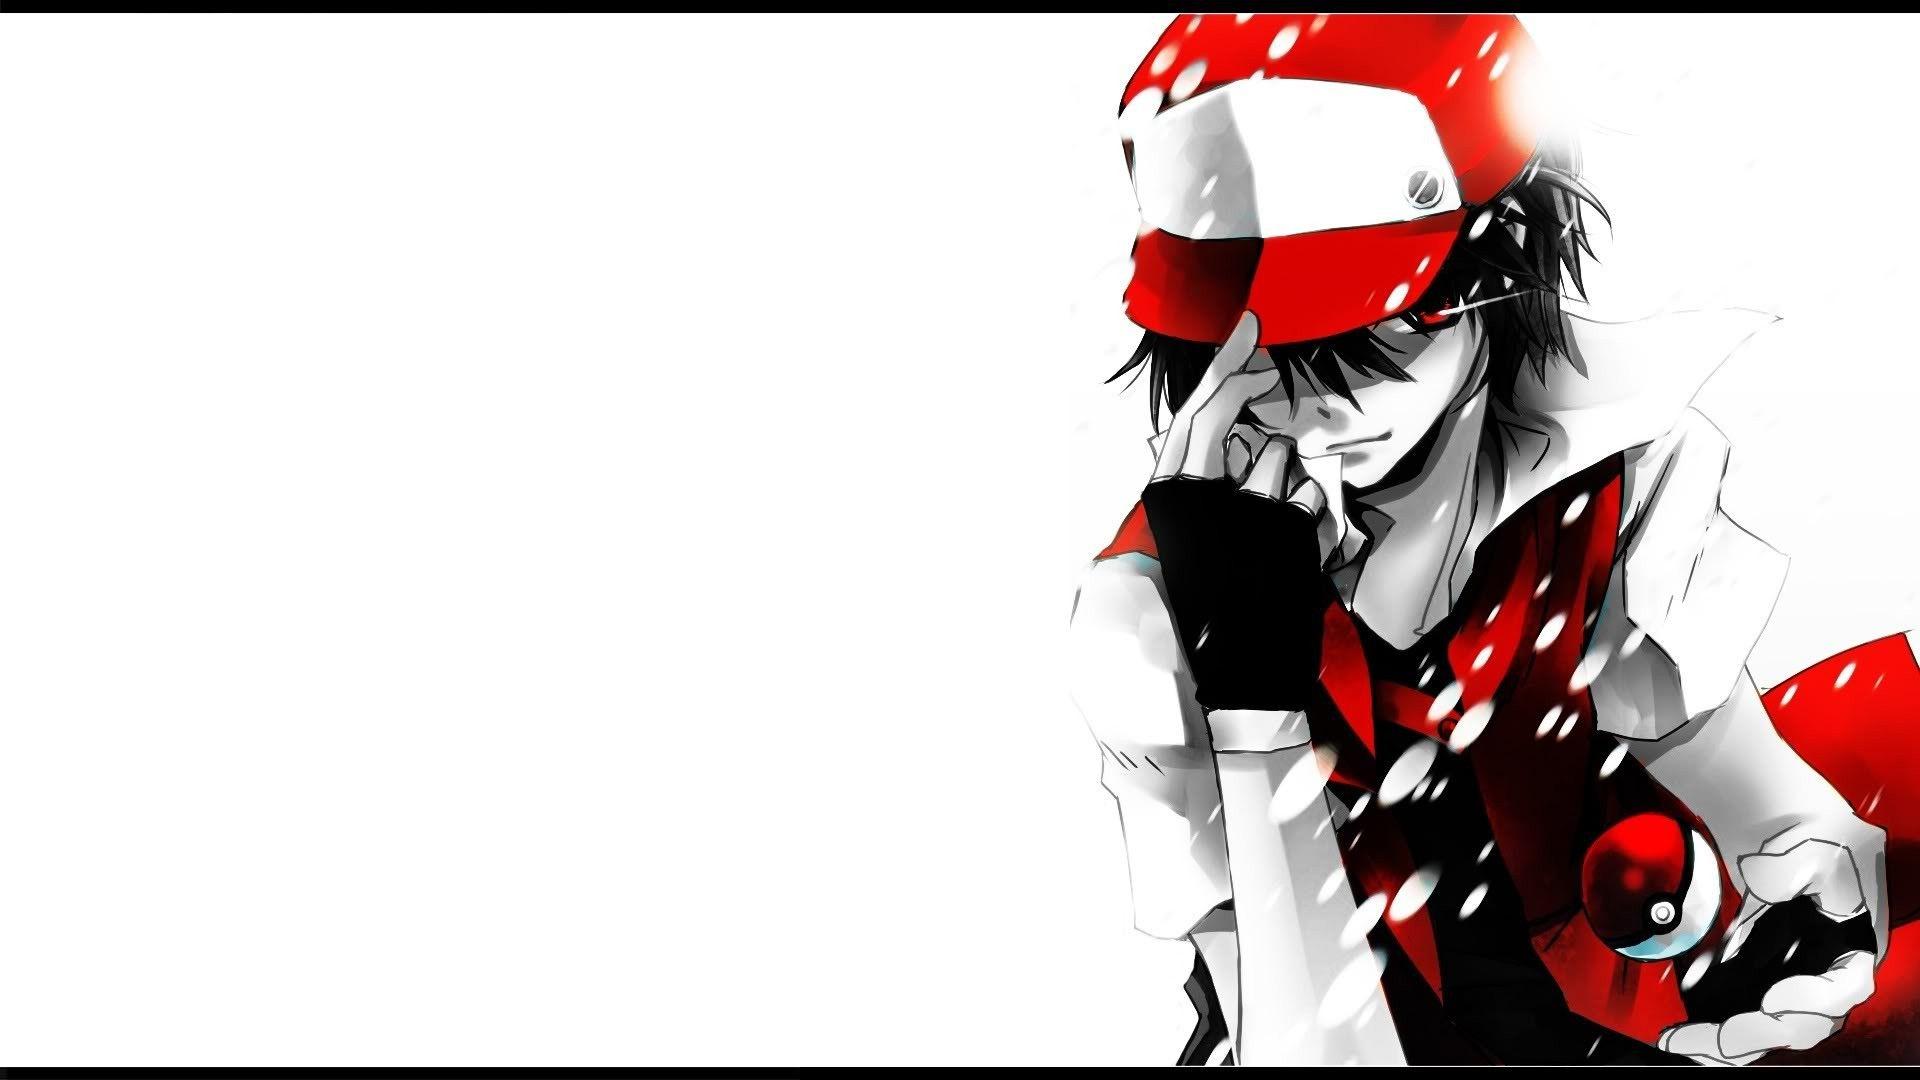 Pokemon Creed Iii Cool Anime Wallpapers Hd Anime Wallpapers Anime Backgrounds Wallpapers